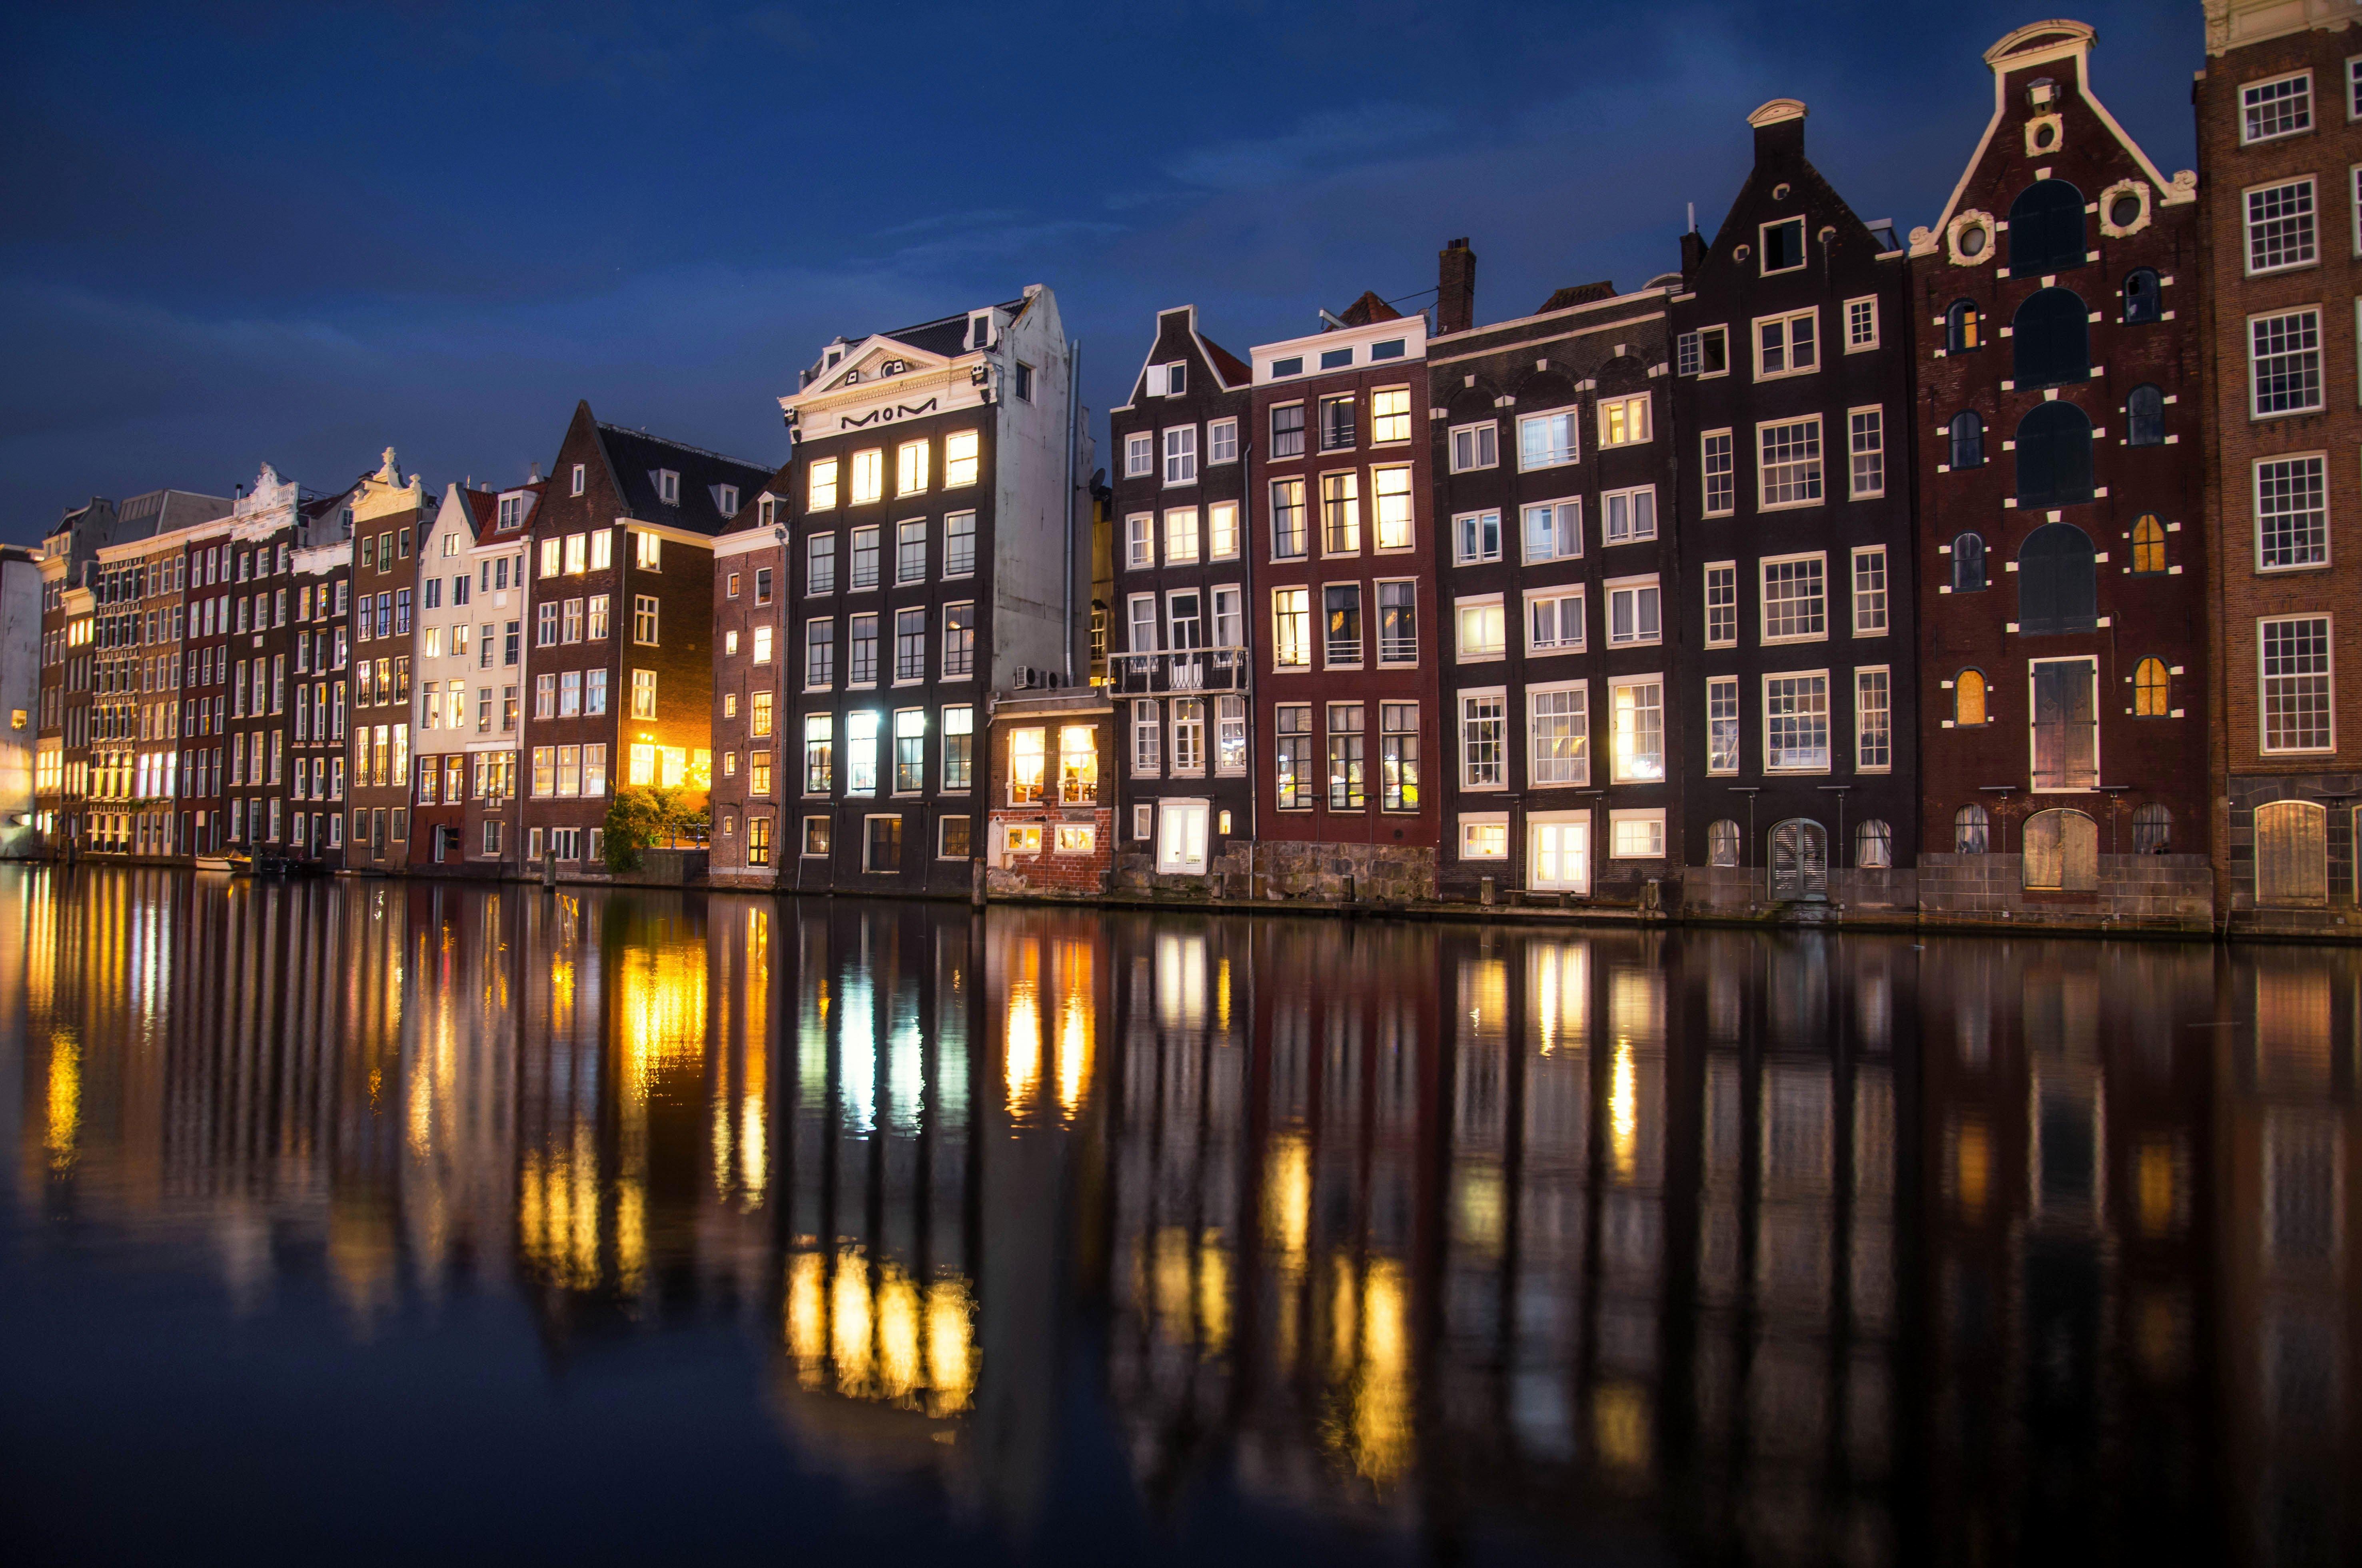 amsterdam netherland night architecture toyhouse egorbugrimov голандия амстердам ночь отражение европа архитектура огни, Егор Бугримов